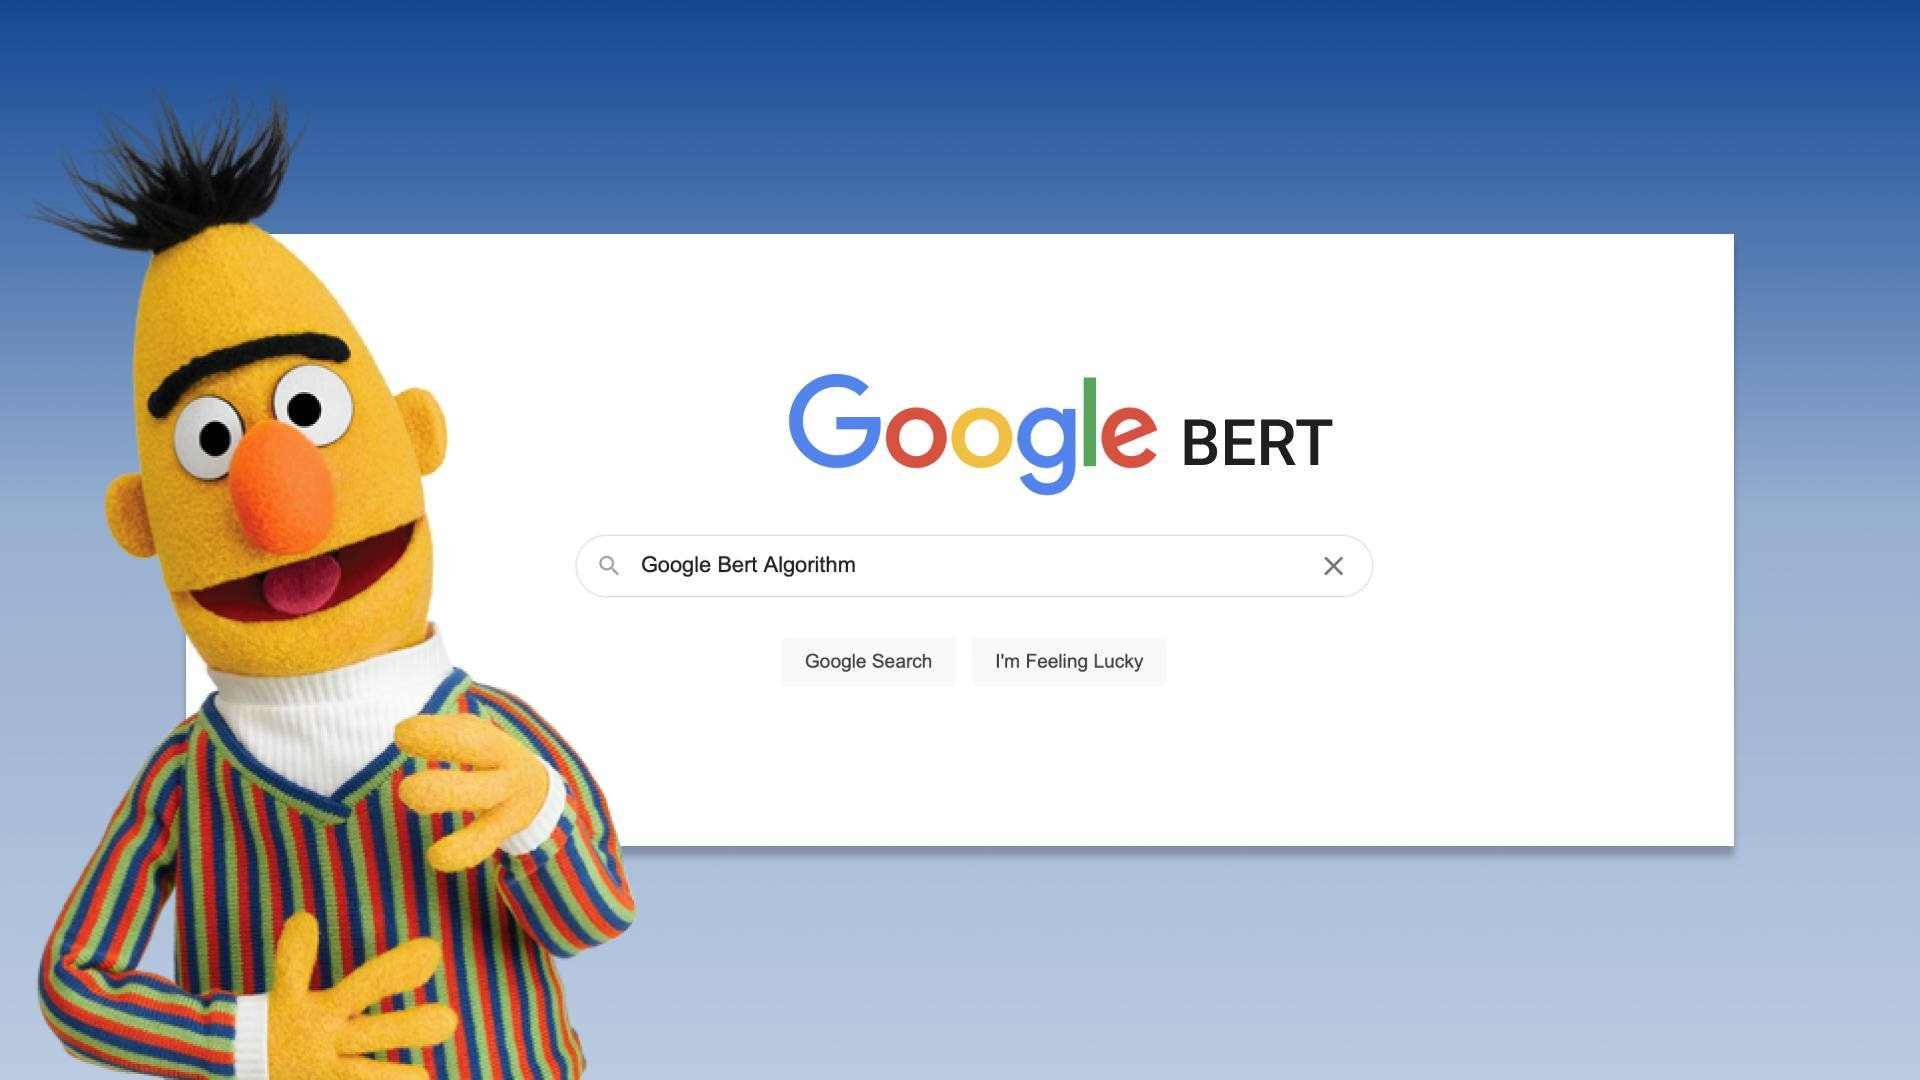 Google's BERT algorithm impacts website traffic